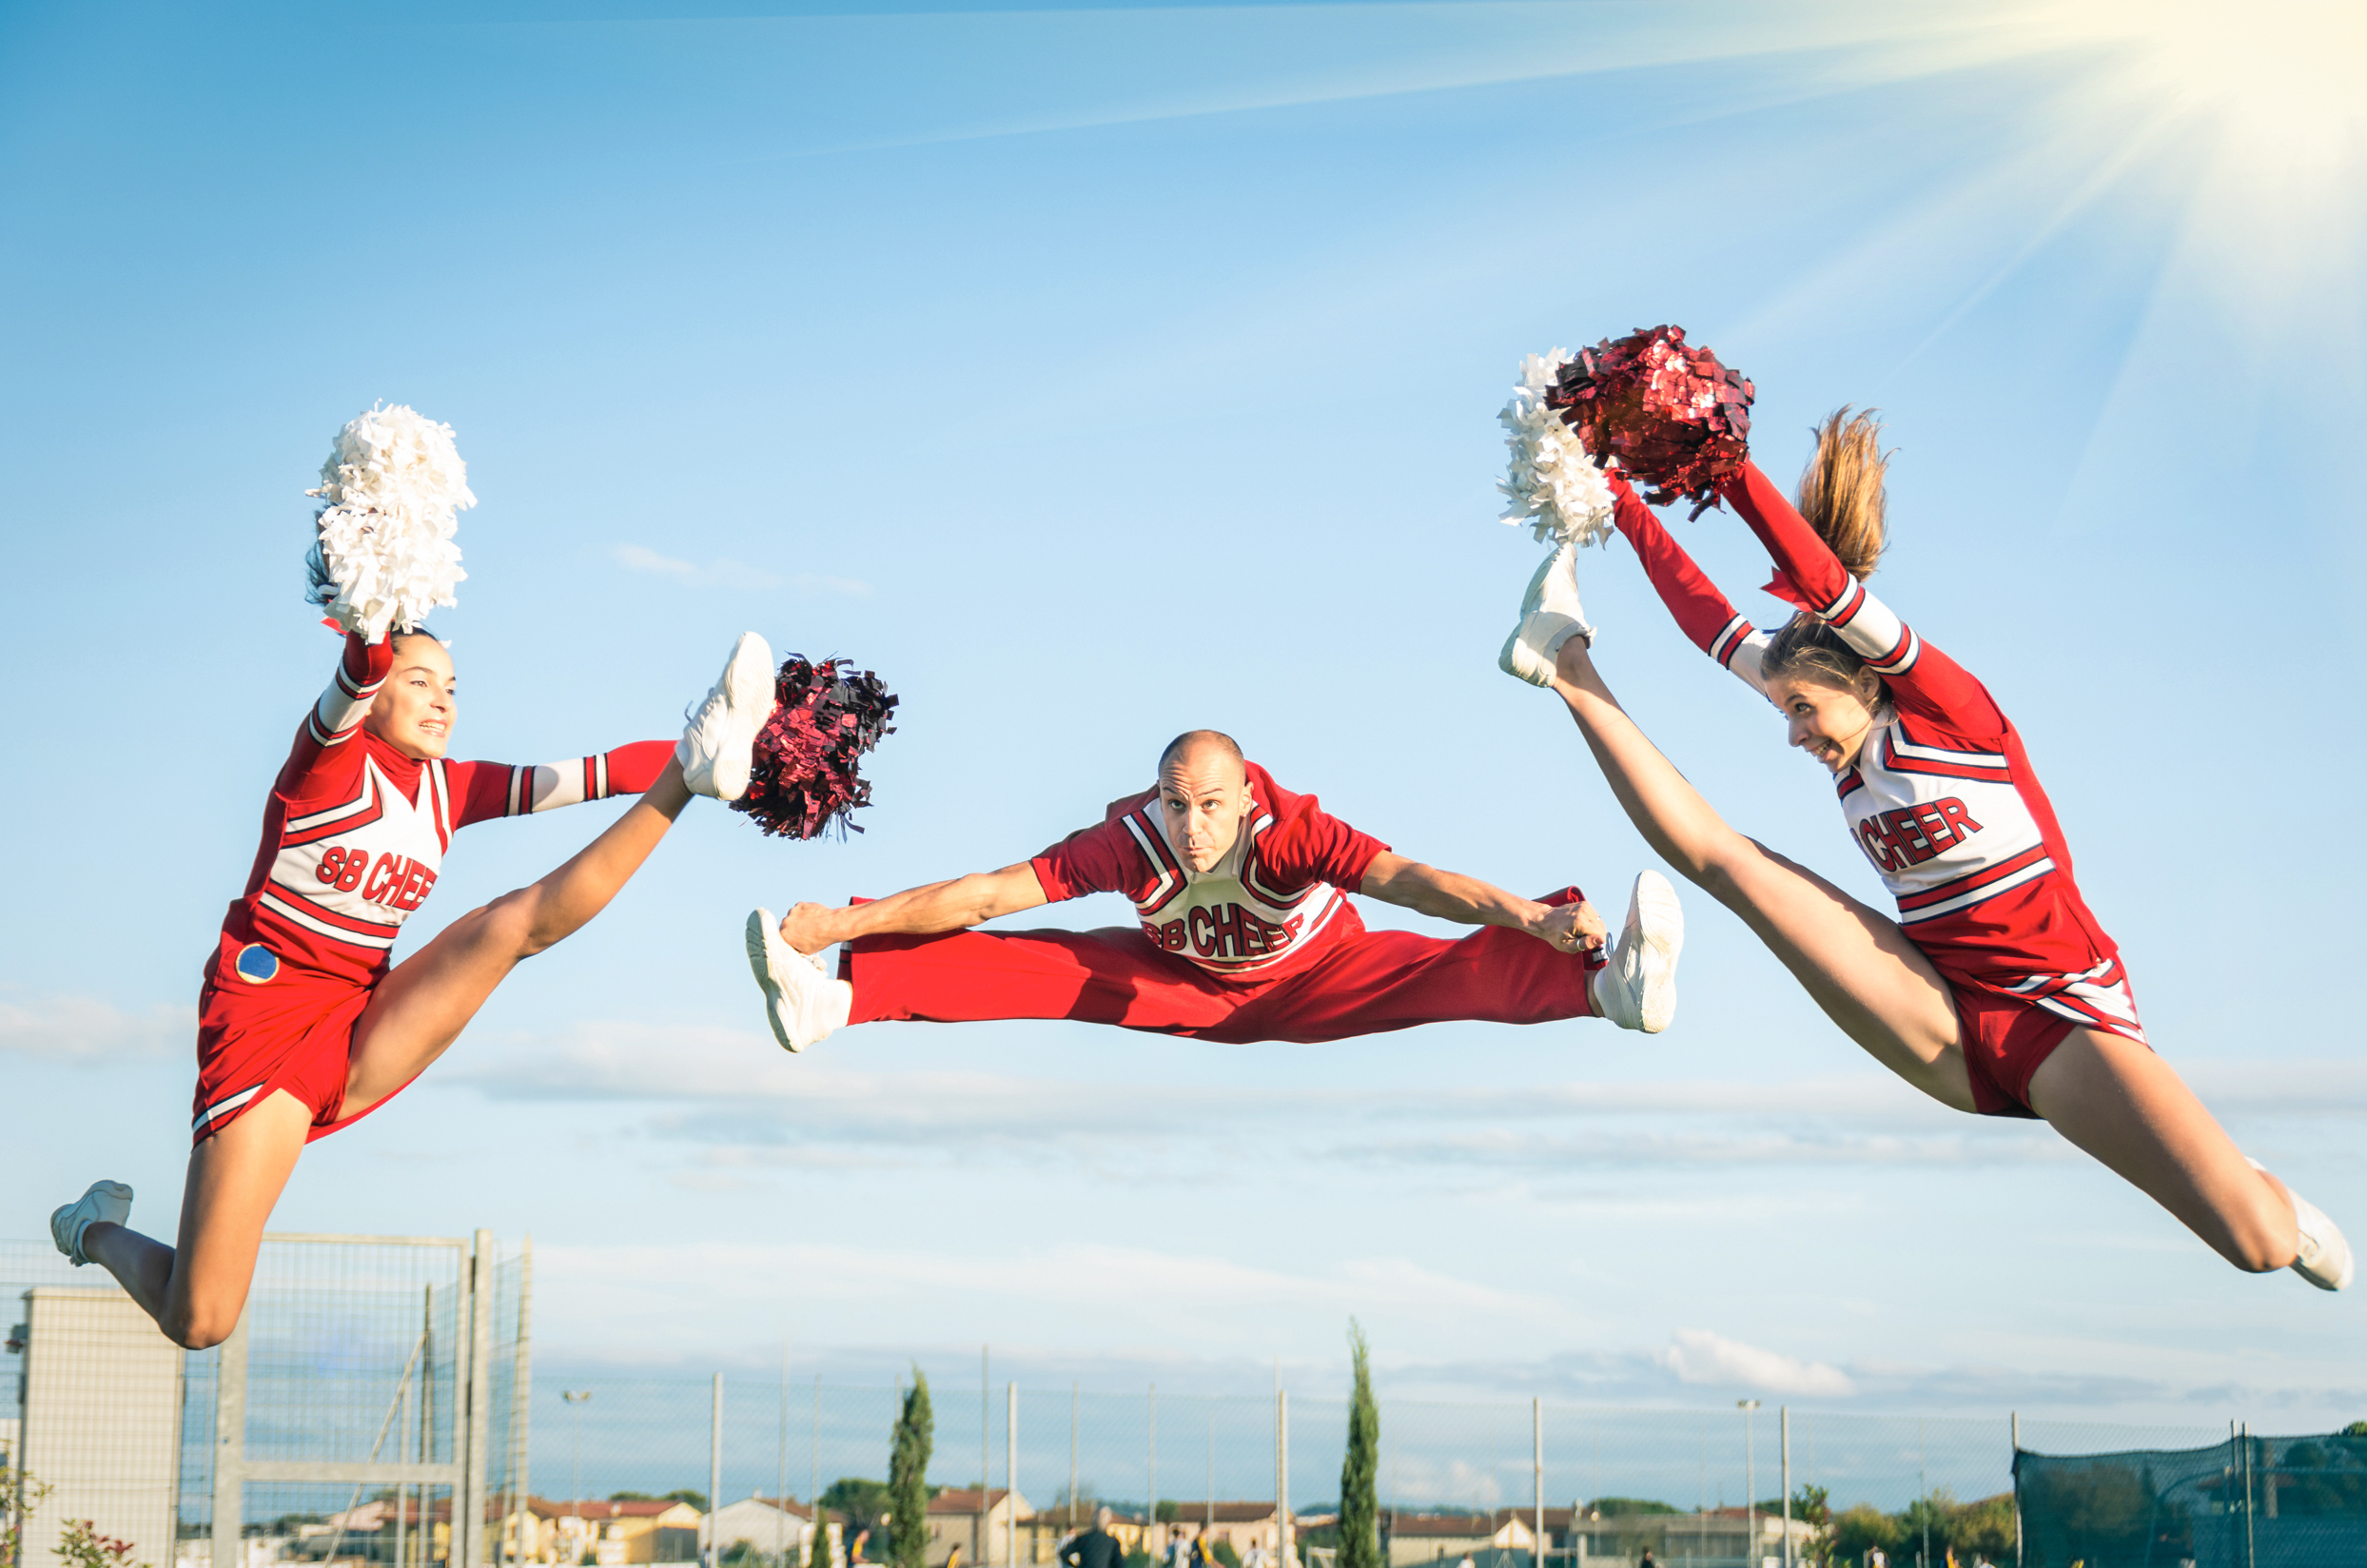 the rigorous life of a cheerleader